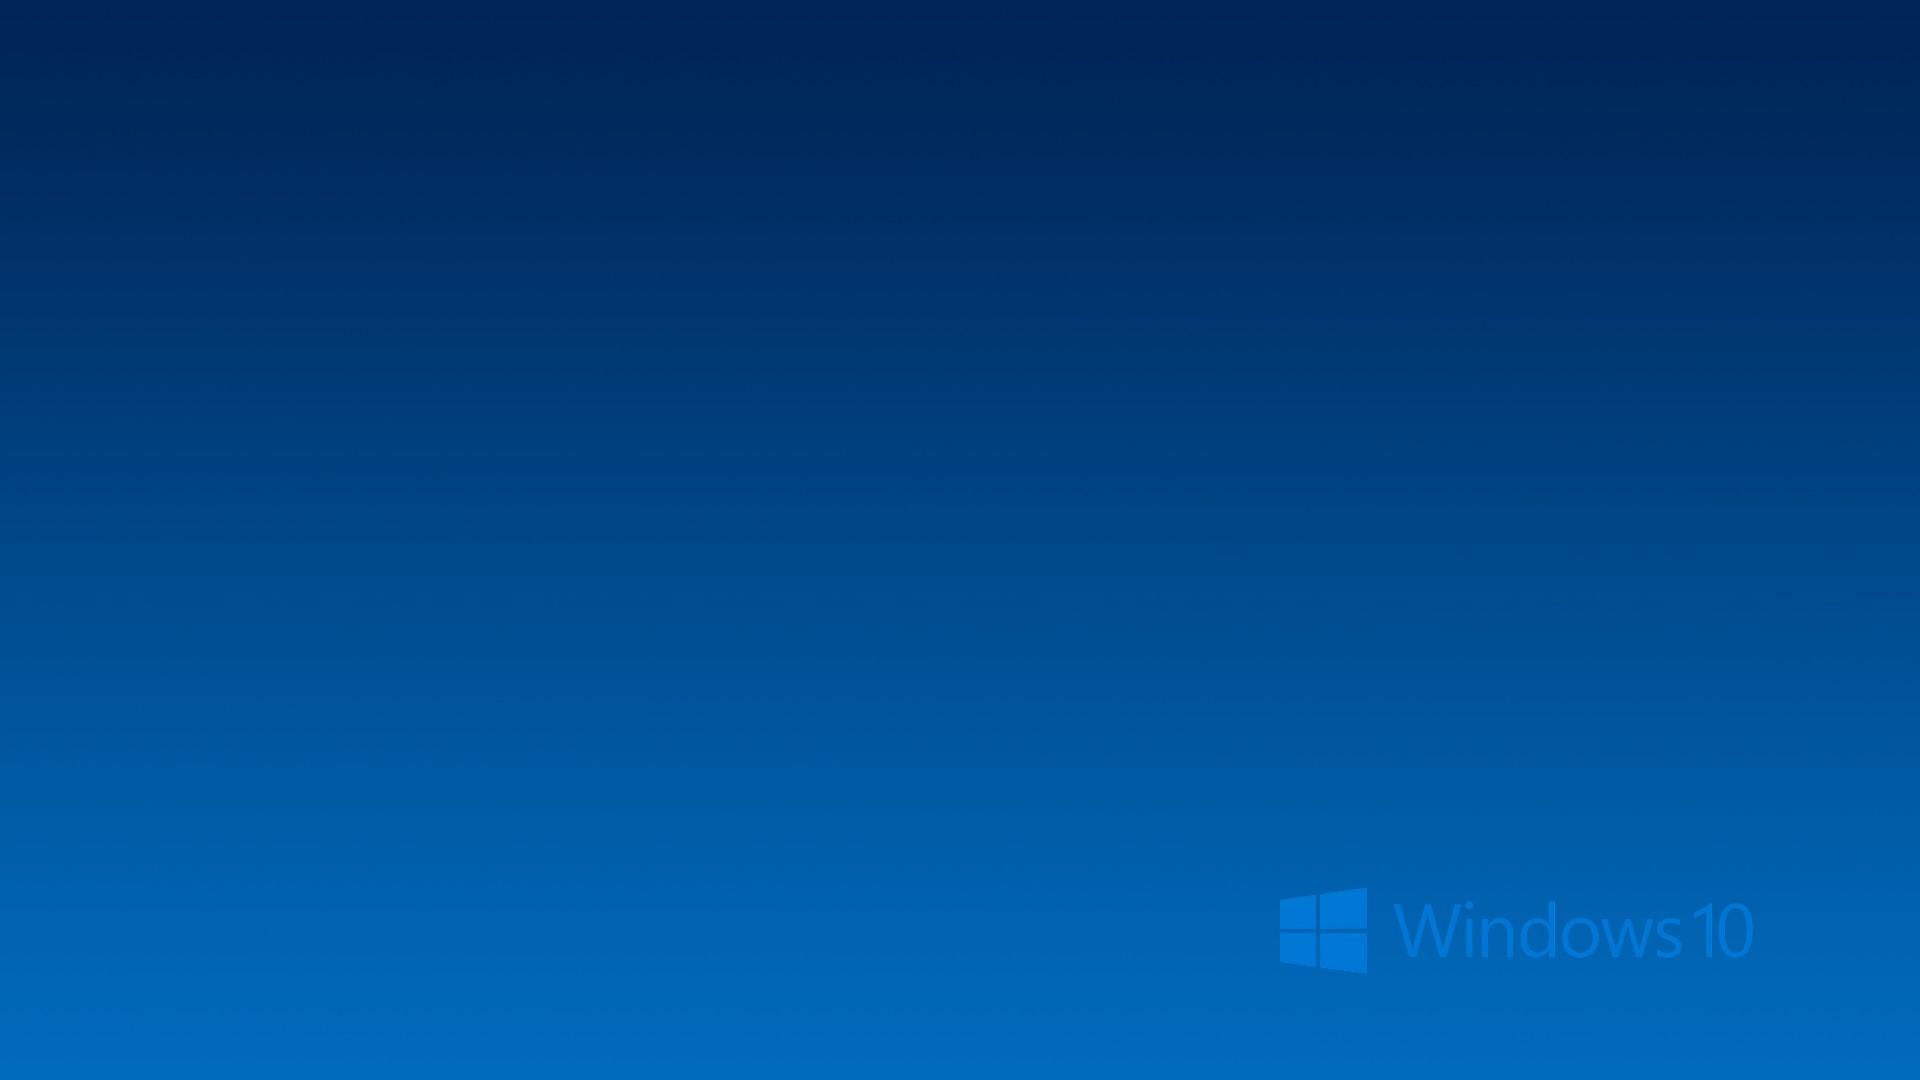 Hd Wallpaper Windows 10 With High-resolution Pixel - Windows 10 Background Blue - HD Wallpaper